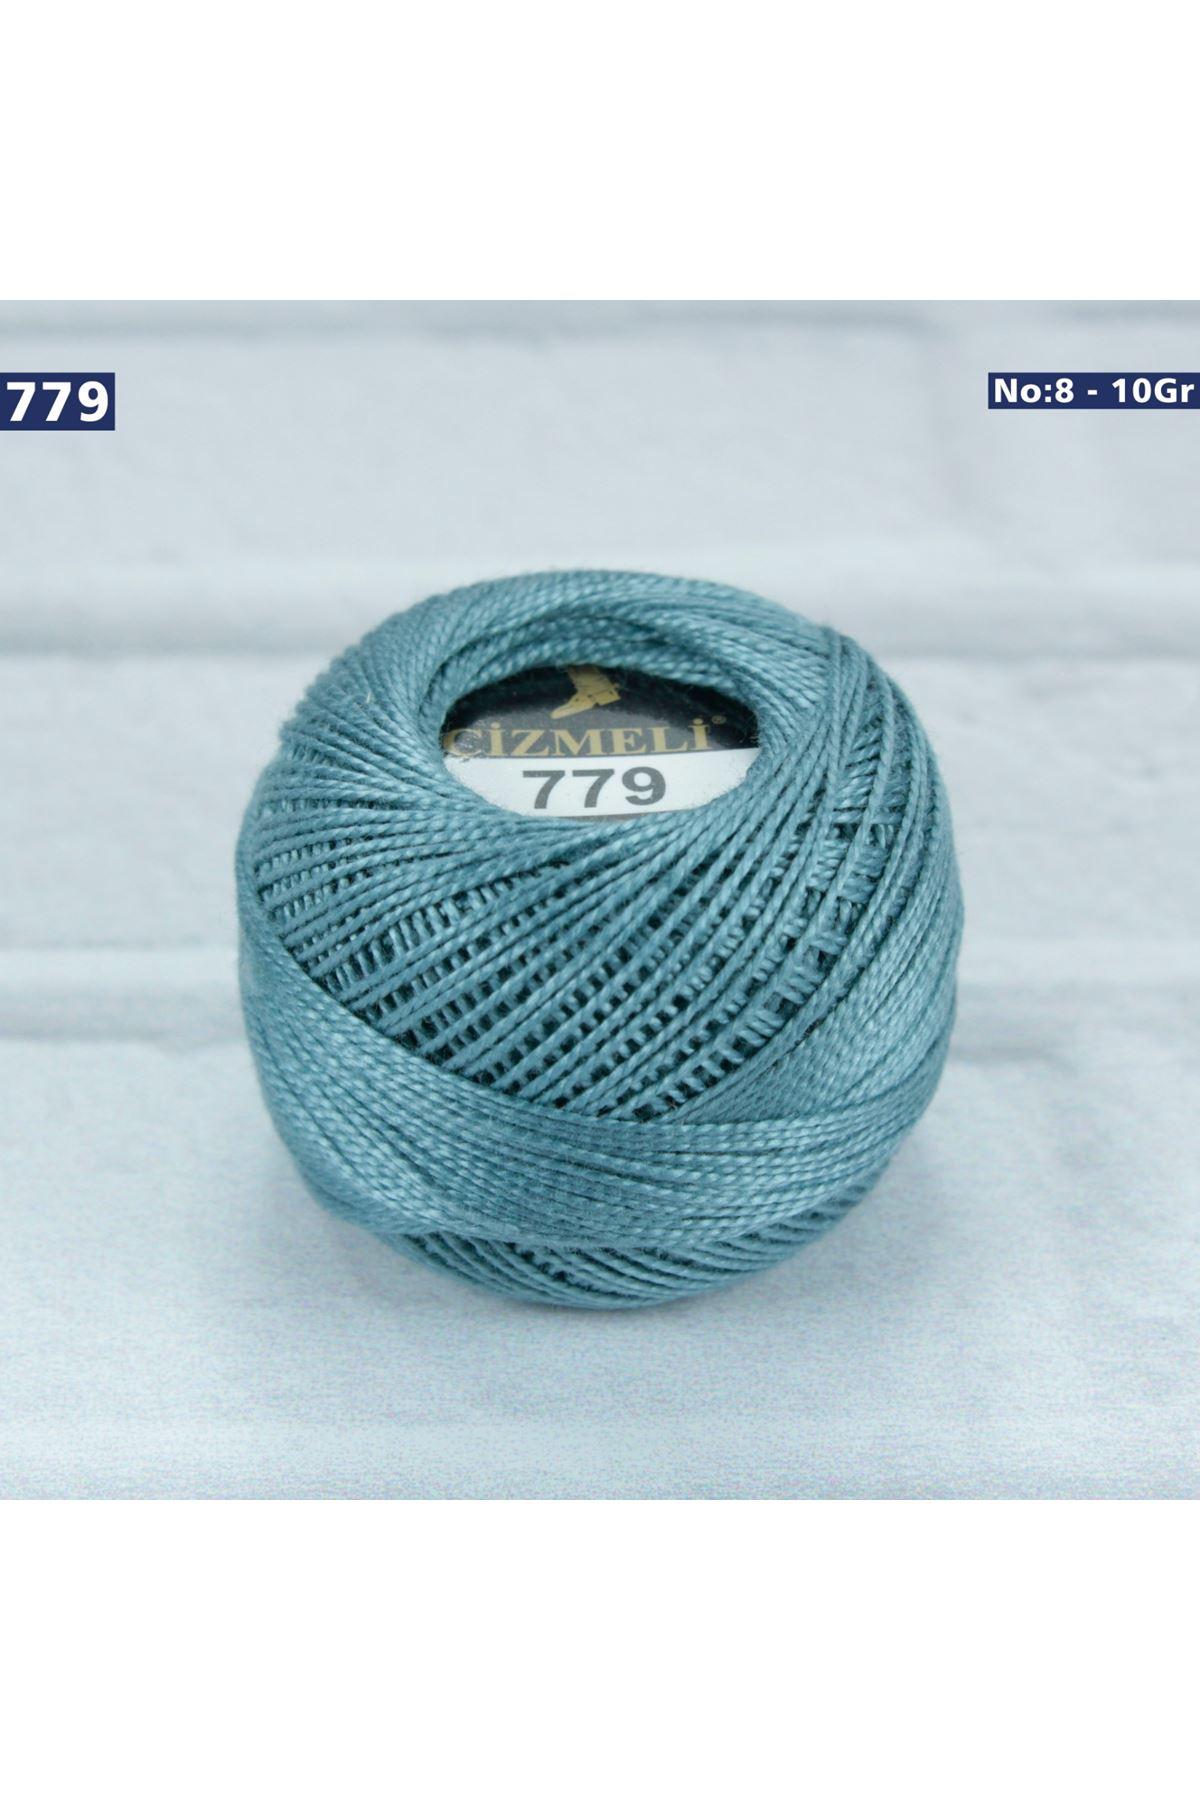 Çizmeli Cotton Perle Nakış İpliği No: 779